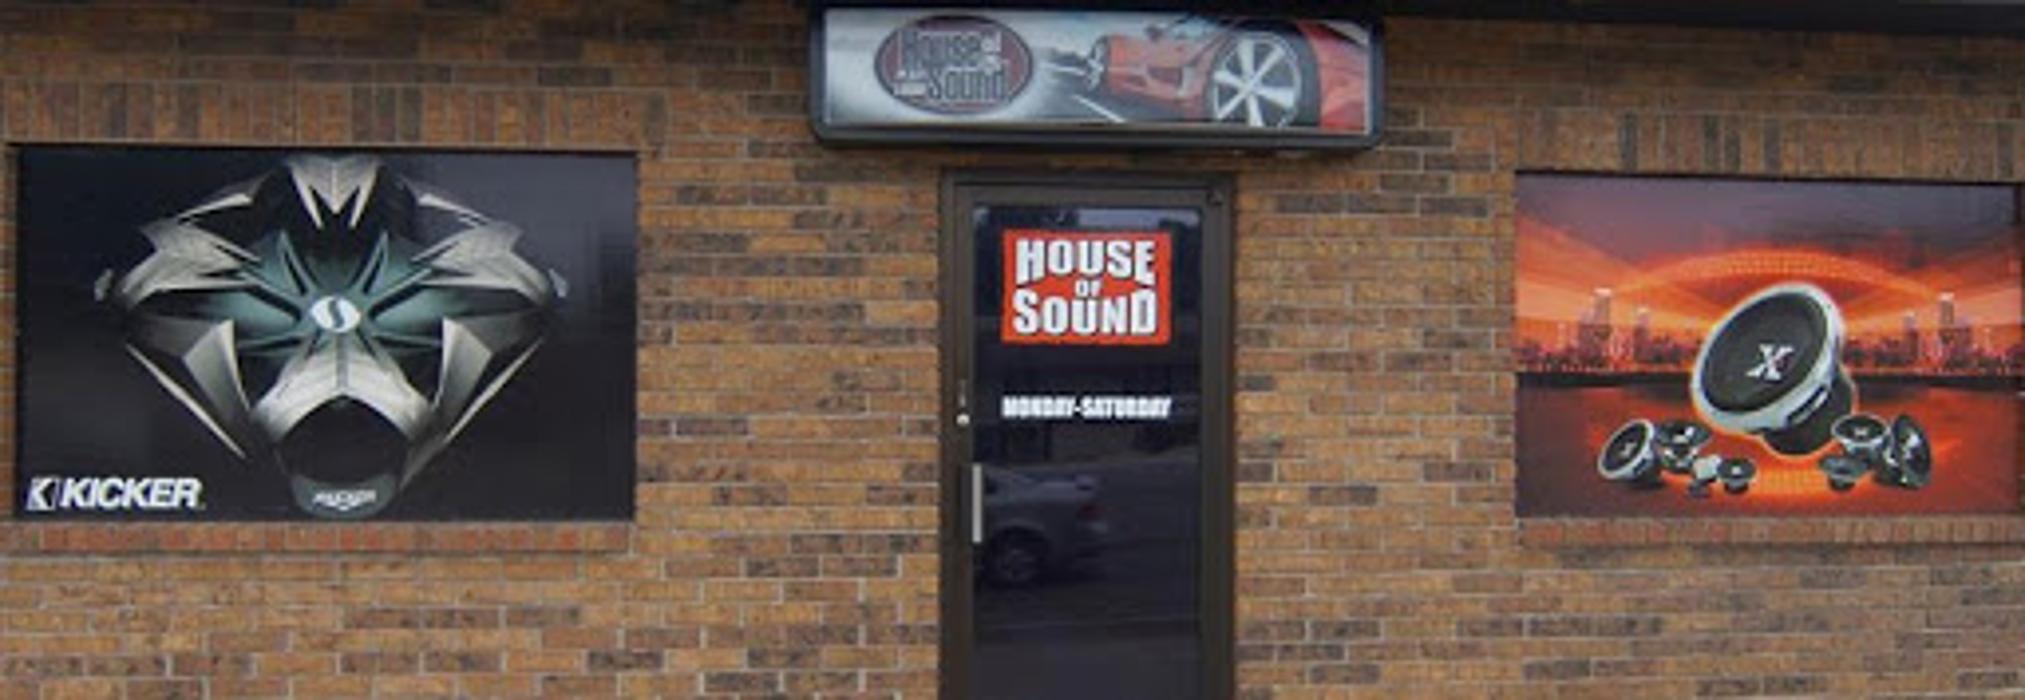 House of Sound - Saint Joseph, MO